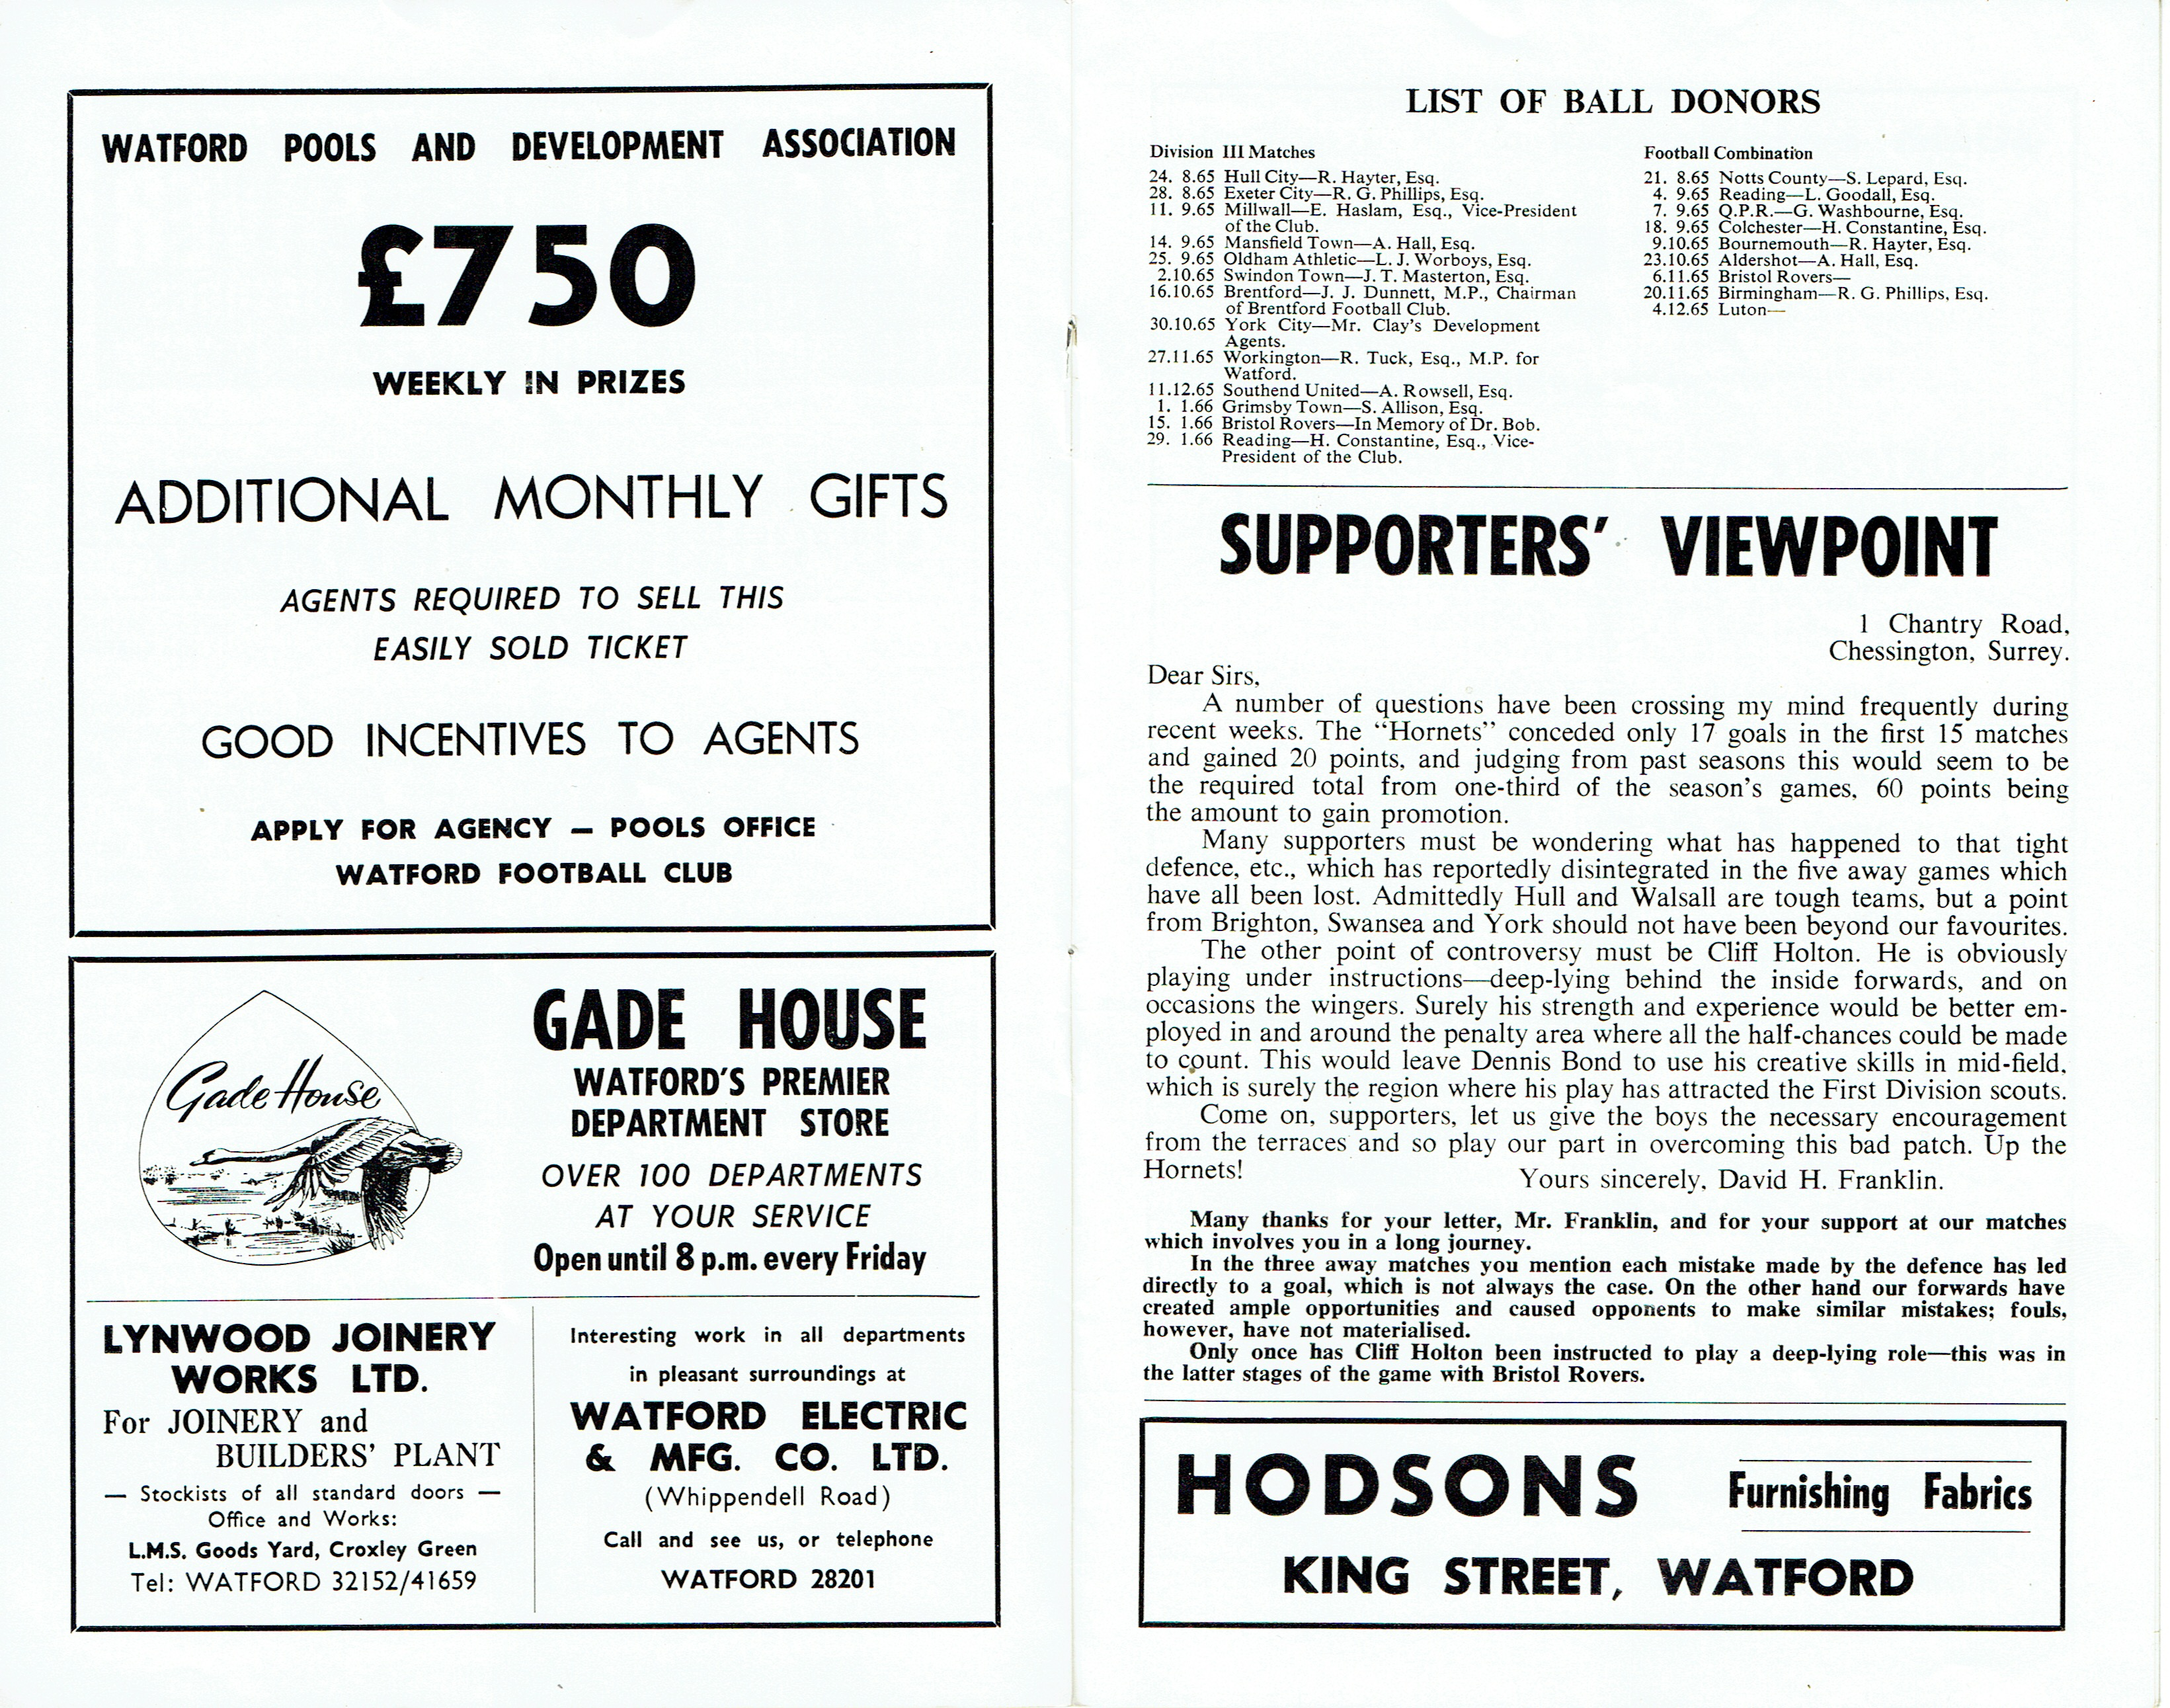 January 1966 – Old Watford